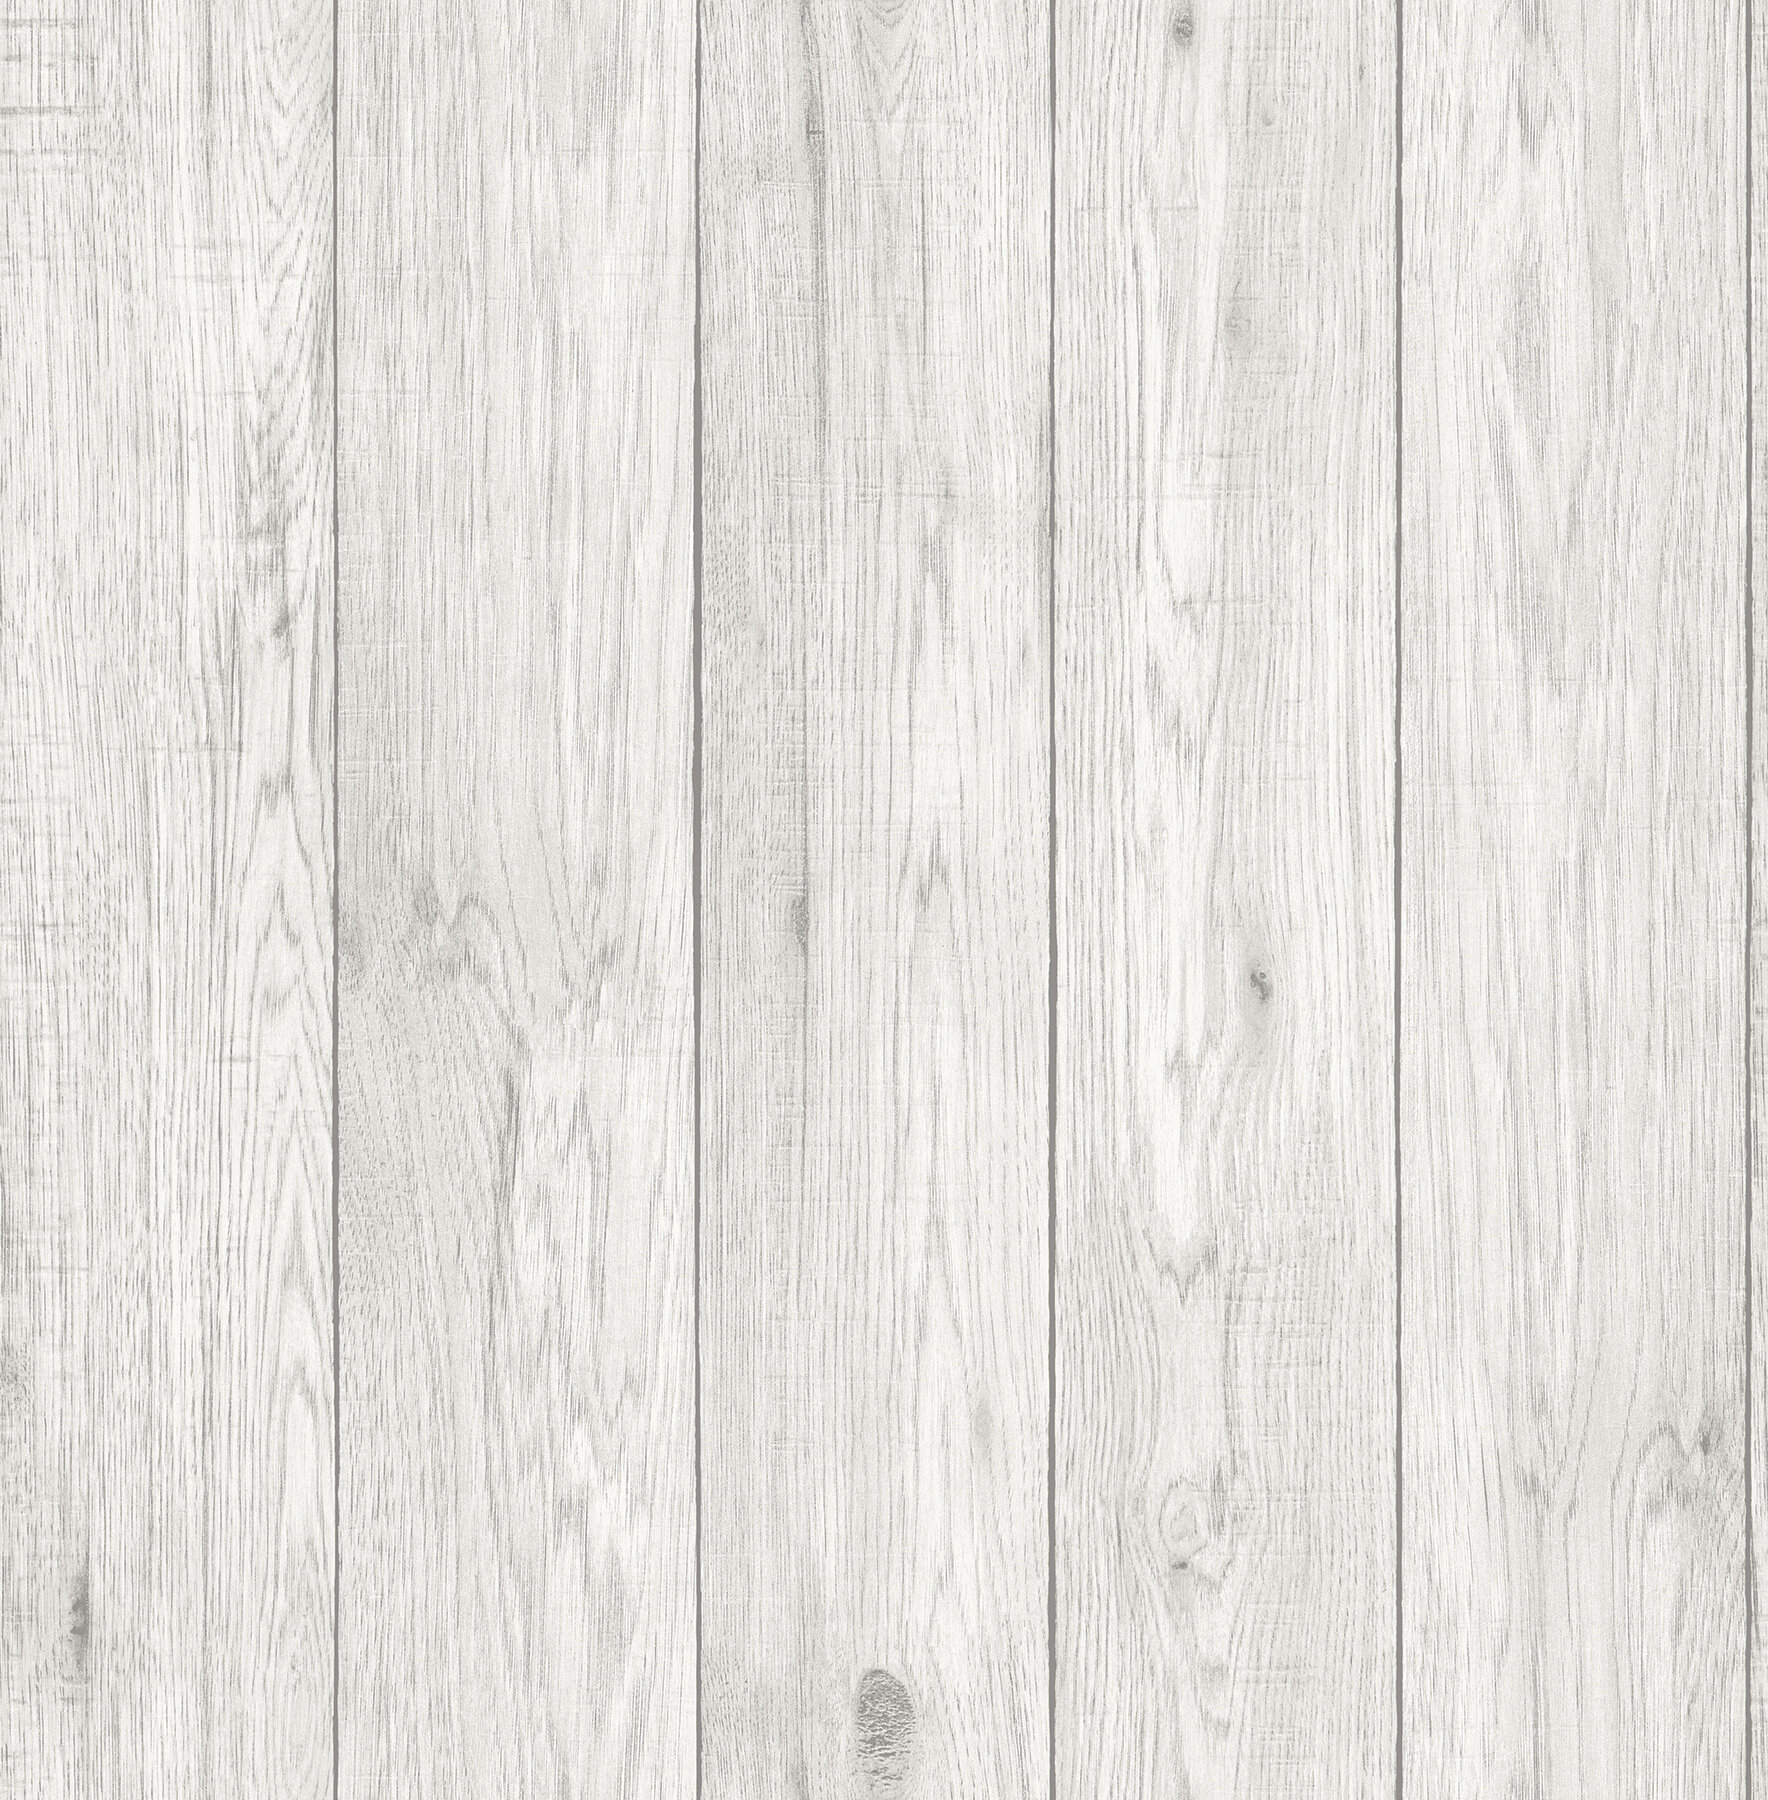 1973WS WALL MURAL PHOTO WALLPAPER XXL Wood Planks